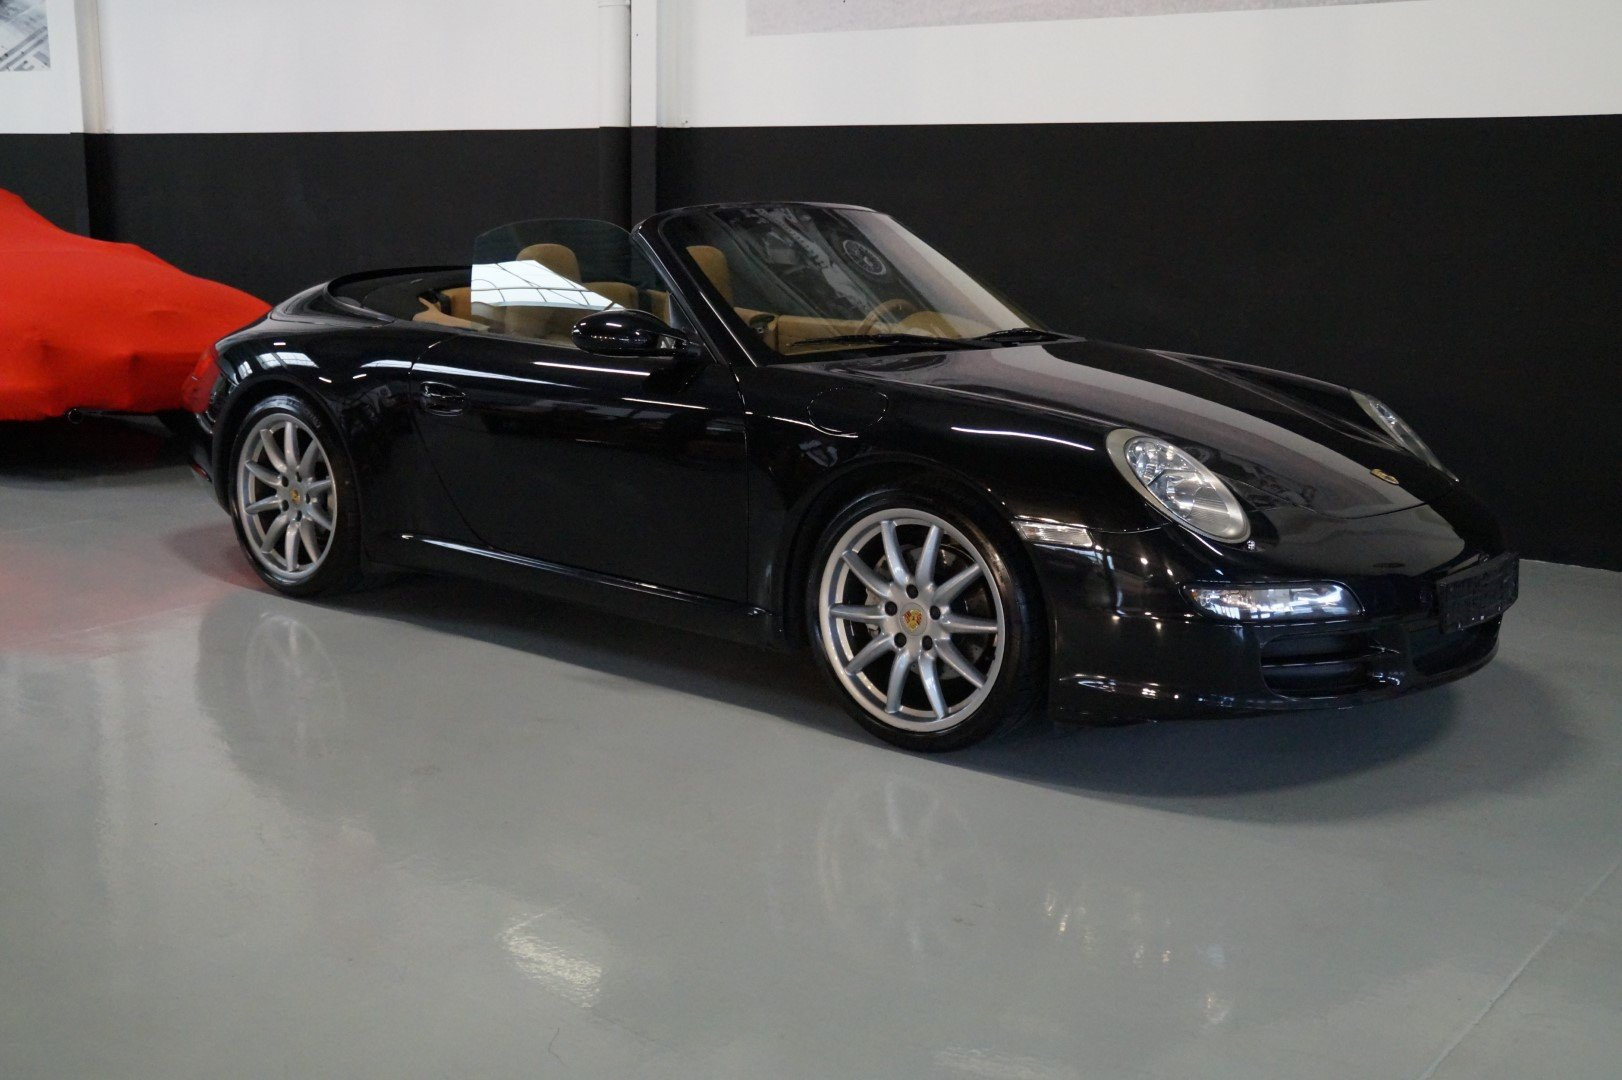 PORSCHE 911 997 Carrera 2 Convertible MANUAL!!! (2006) For Sale (picture 1 of 6)